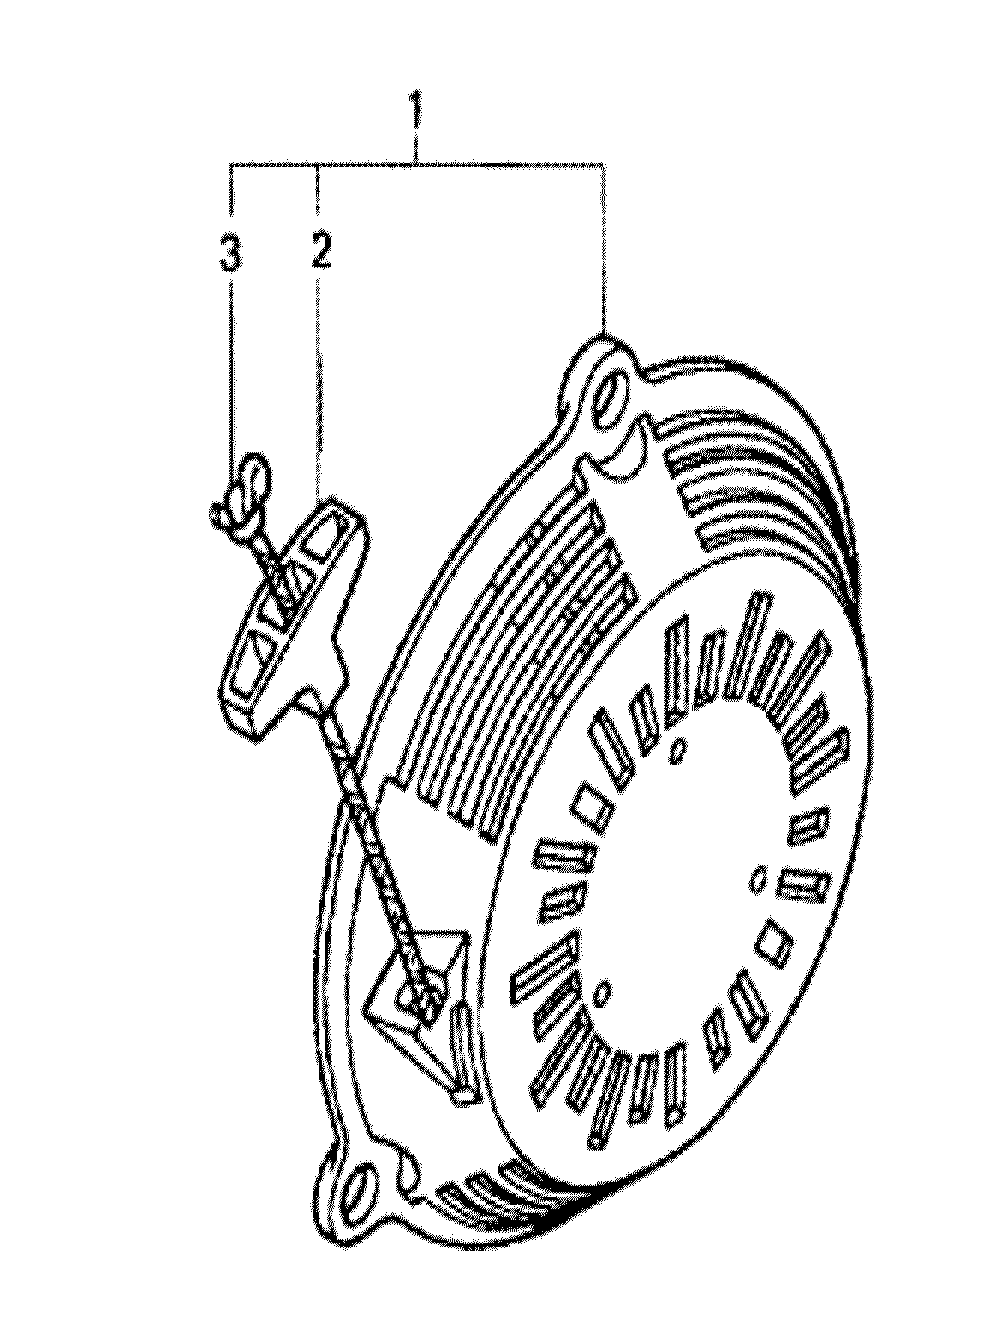 Honda GC160 Type-SHE4 Parts Schematic